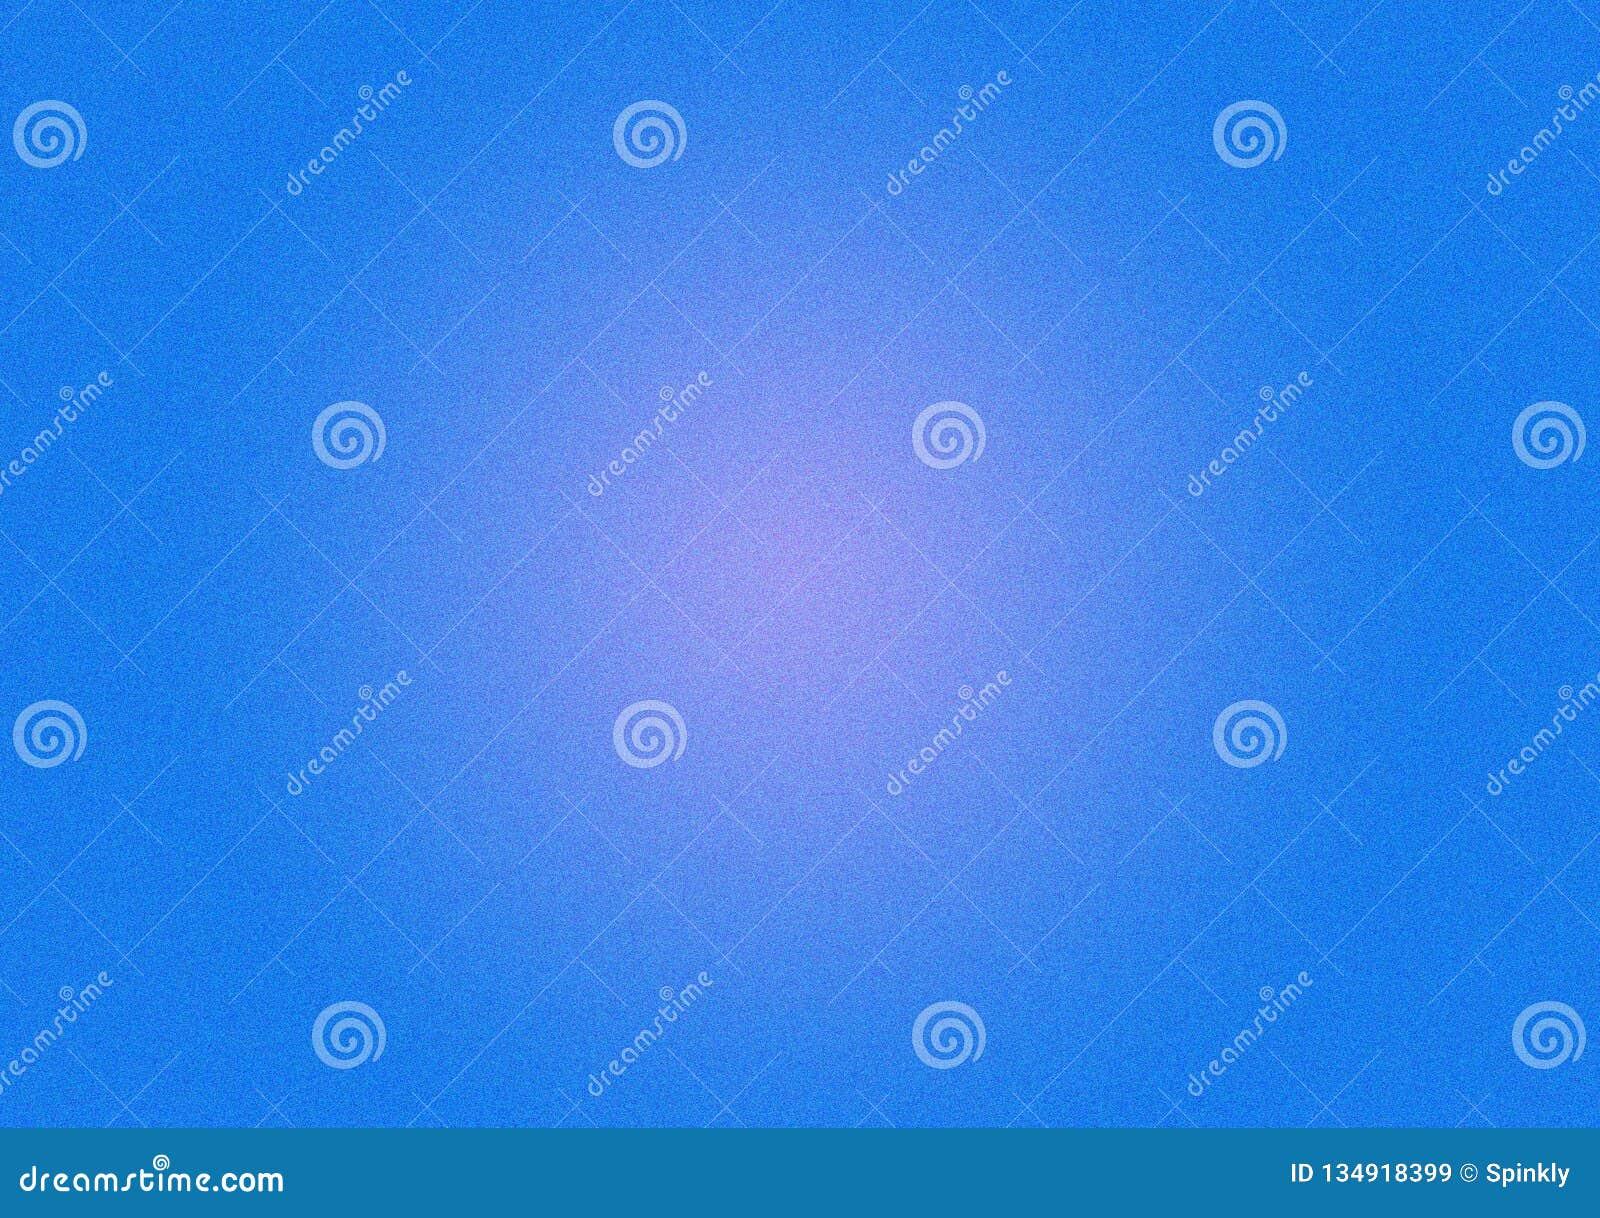 Blue Textured Design Background Wallpaper Stock Image Image Of